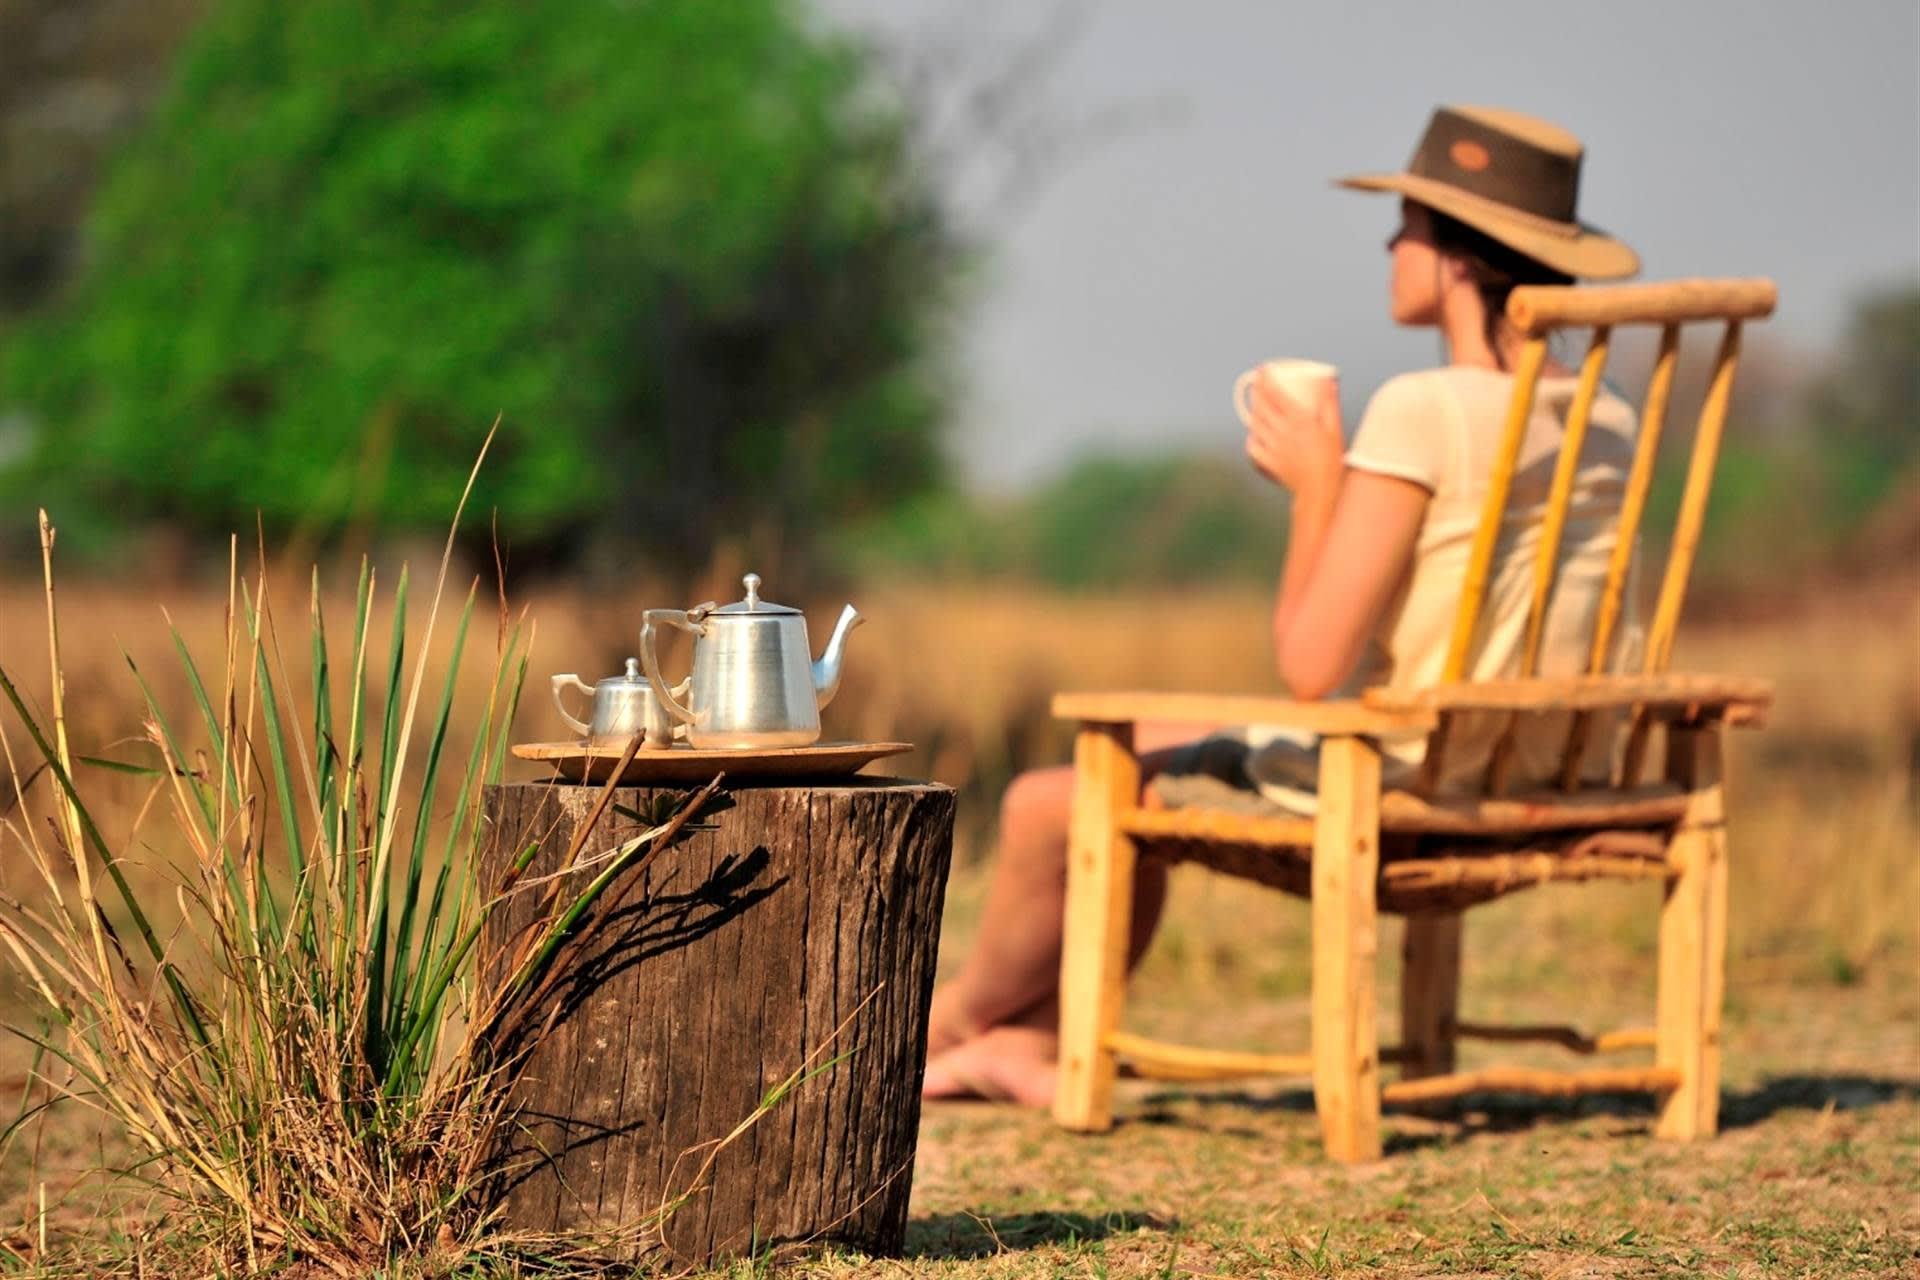 best relaxing hotel to unwind in SOUTH LUANGWA, ZAMBIA